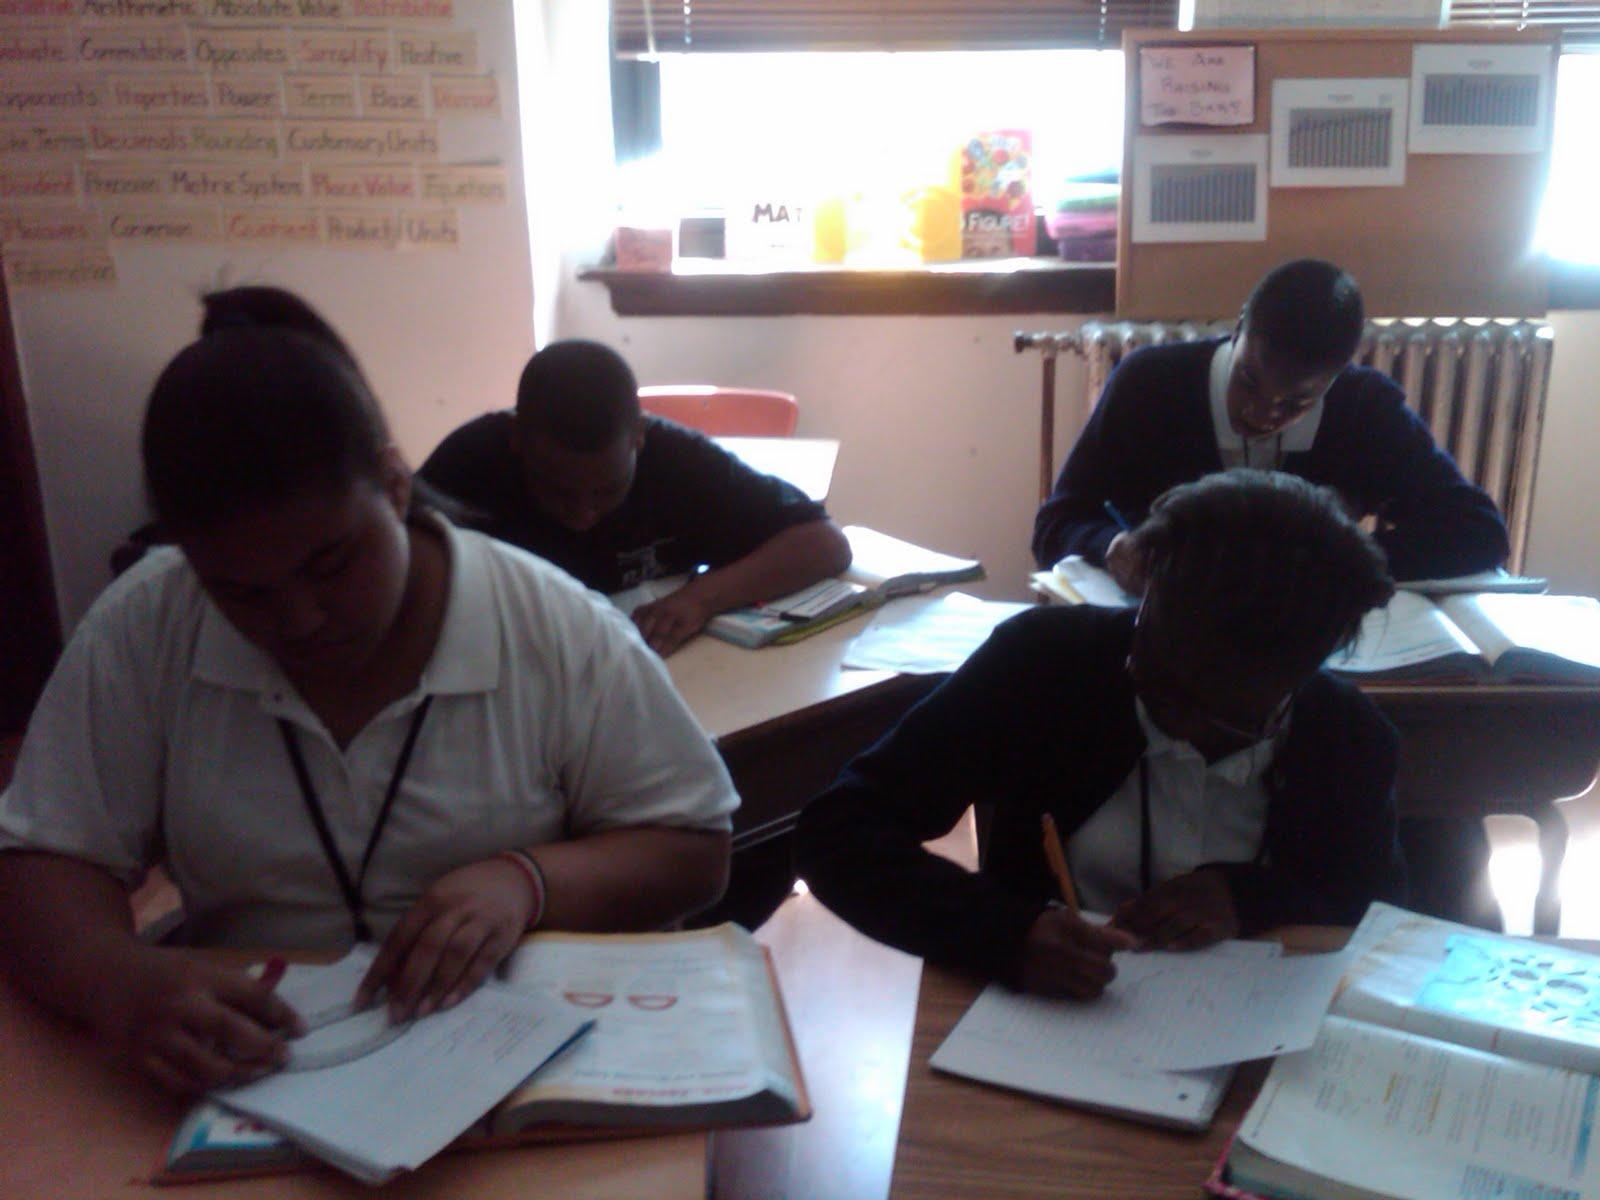 Miss Granholm S Classes 8th Grade Math Measuring Angles Using Protractors